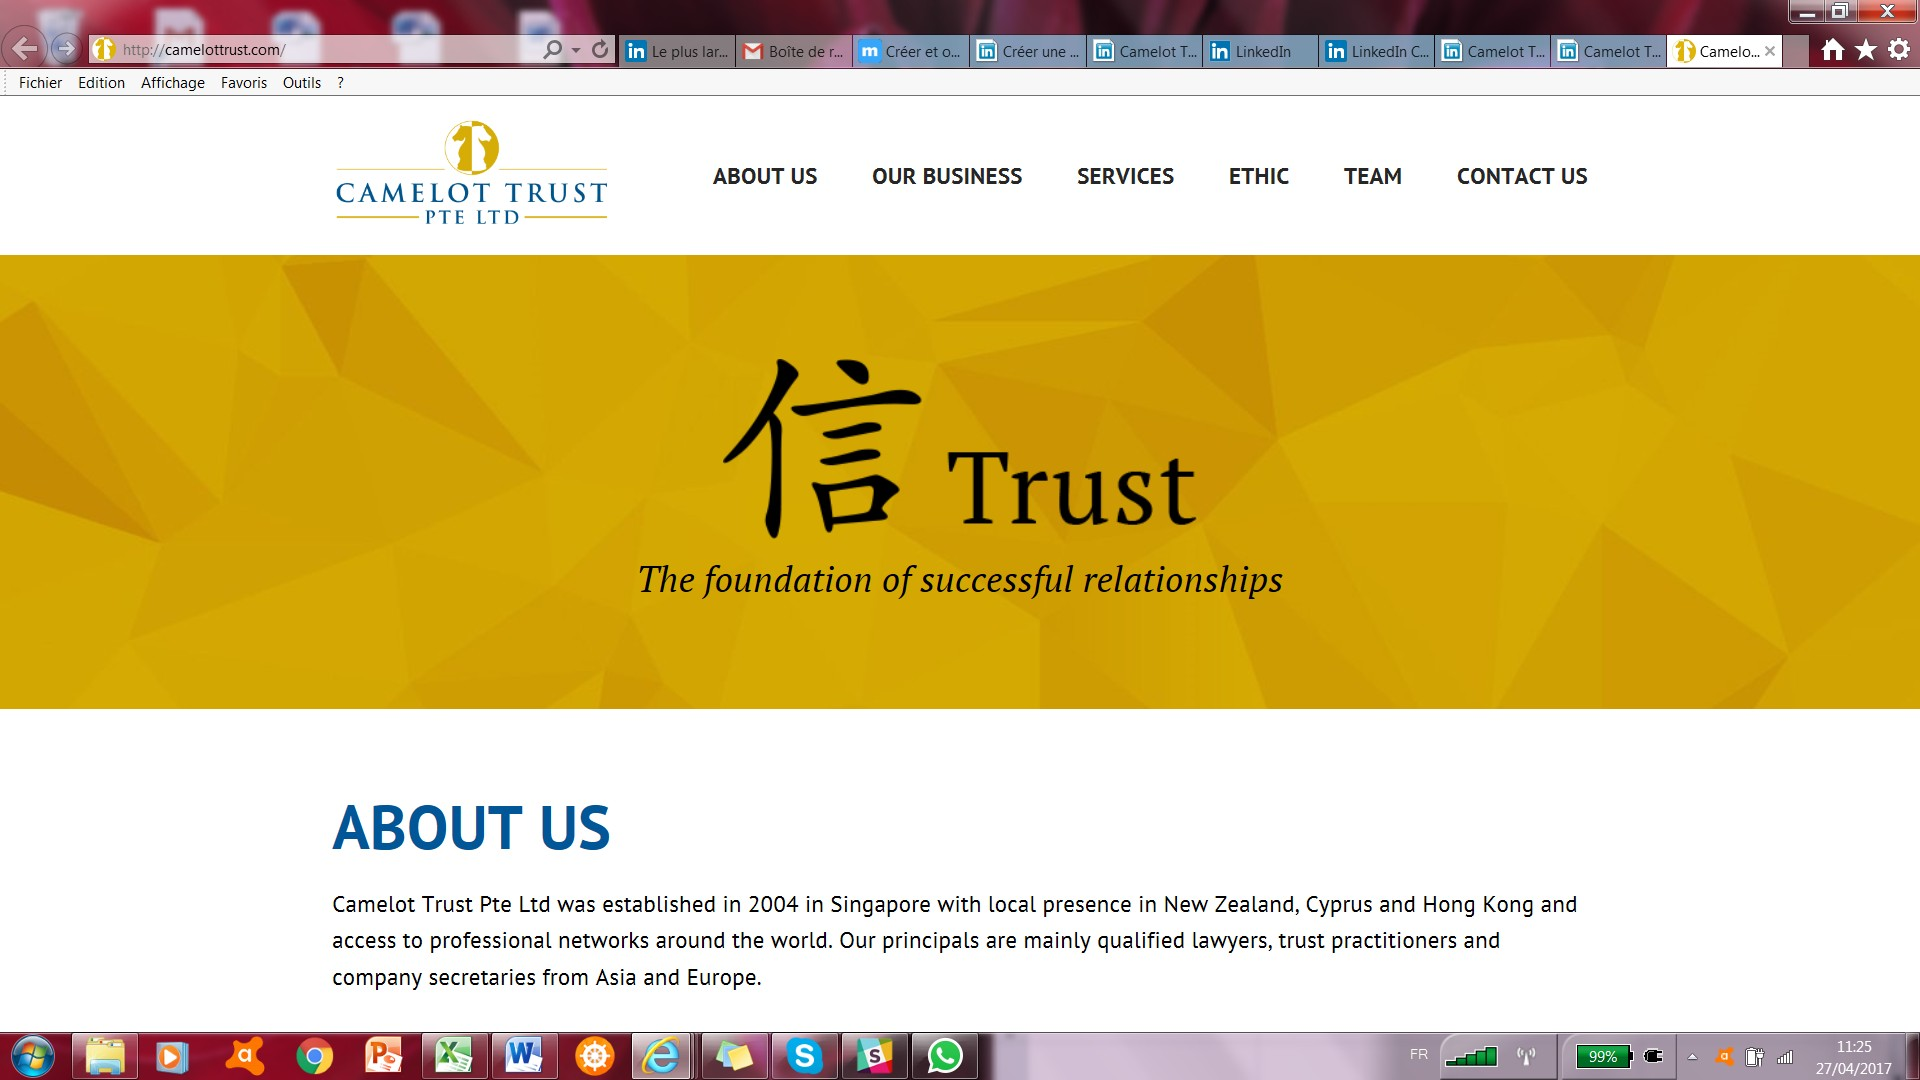 Camelot Trust Pte Ltd Linkedin